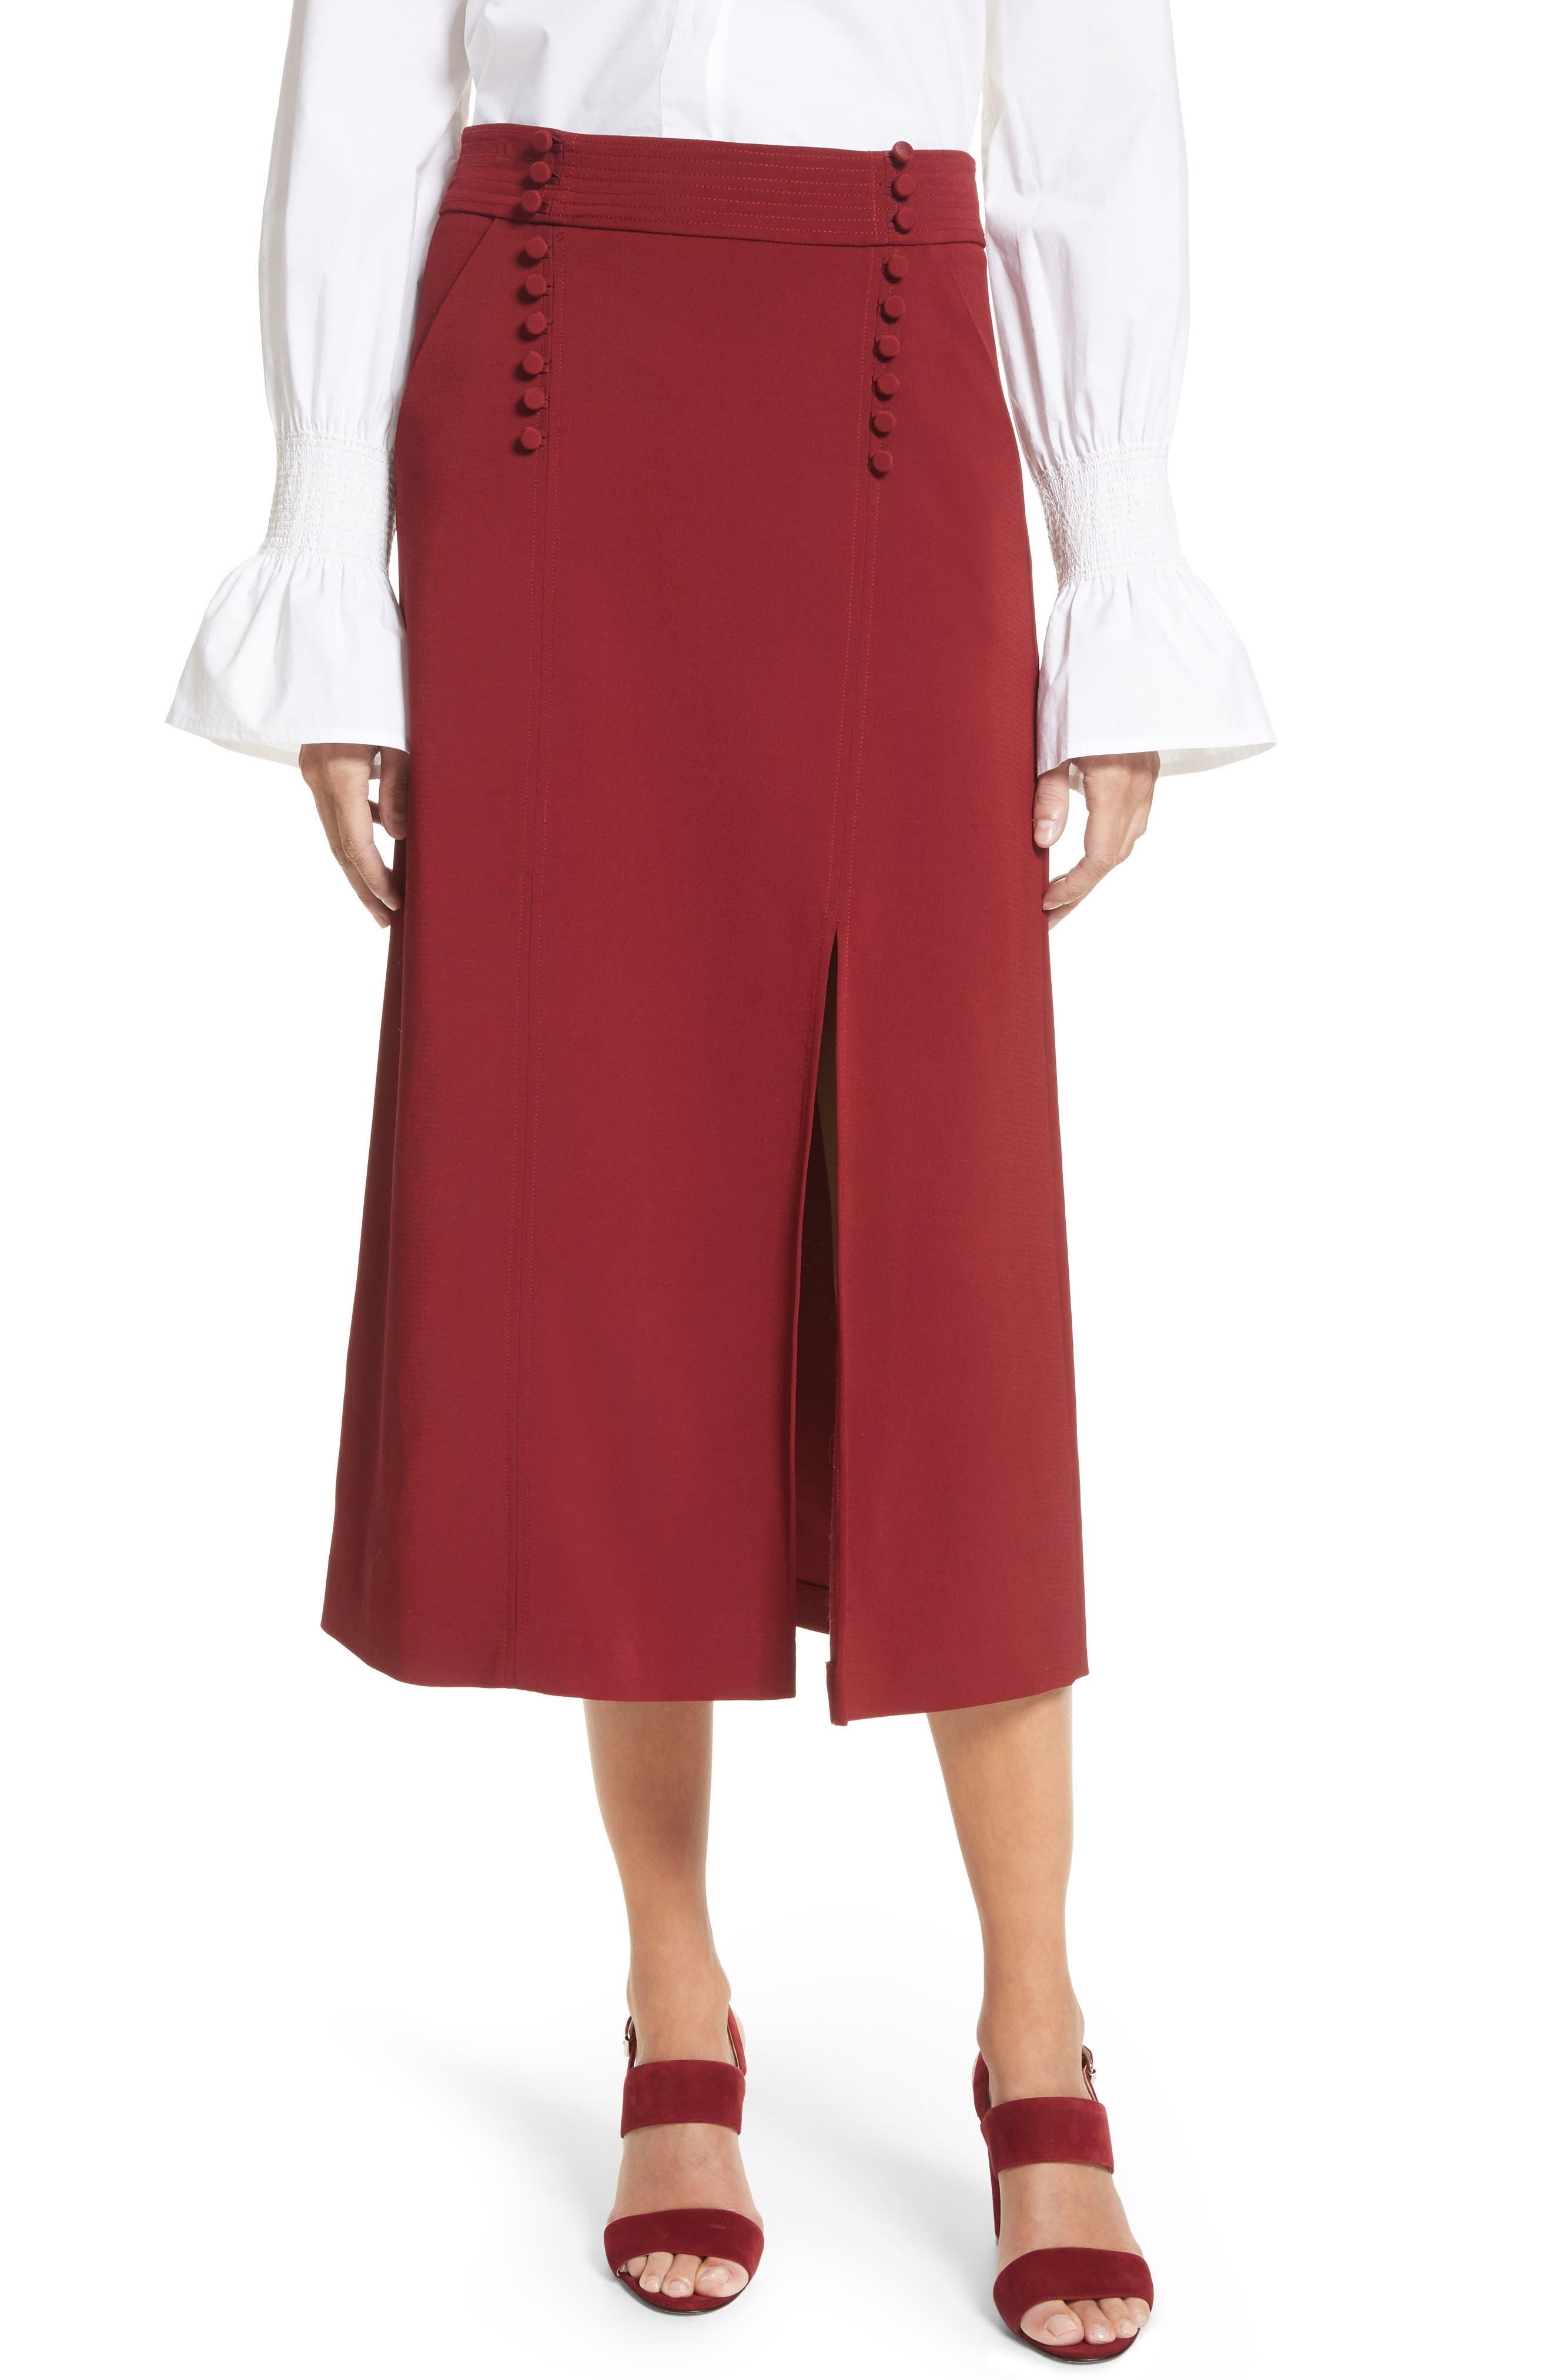 A.L.C. Sydney Skirt